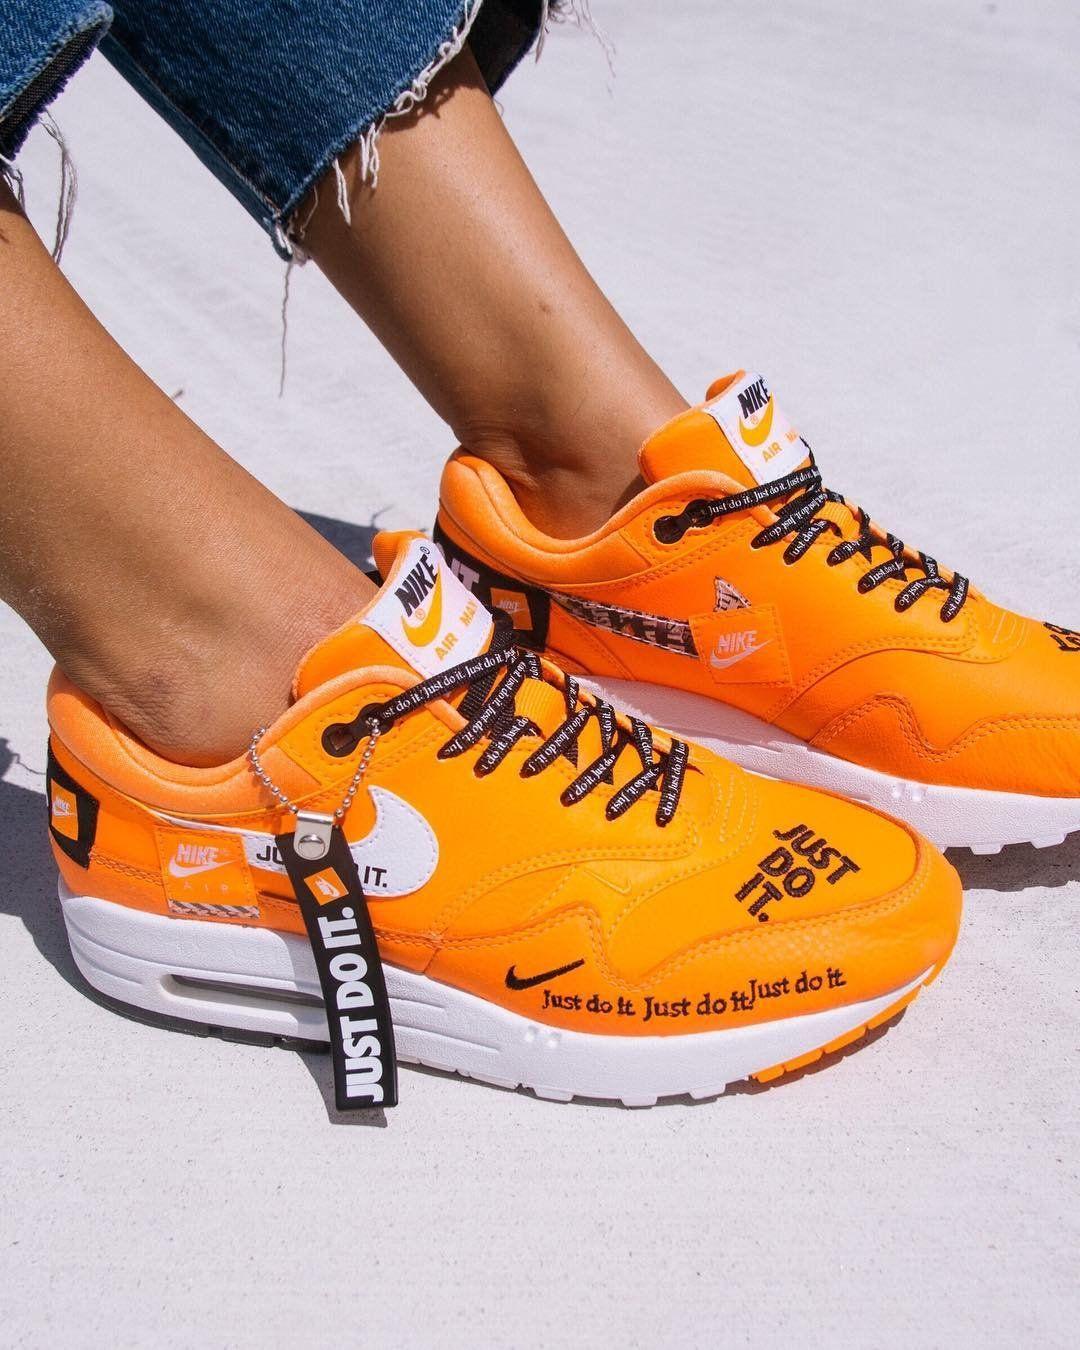 1100 Best Nike sneakers images | Sneakers, Nike, Me too shoes